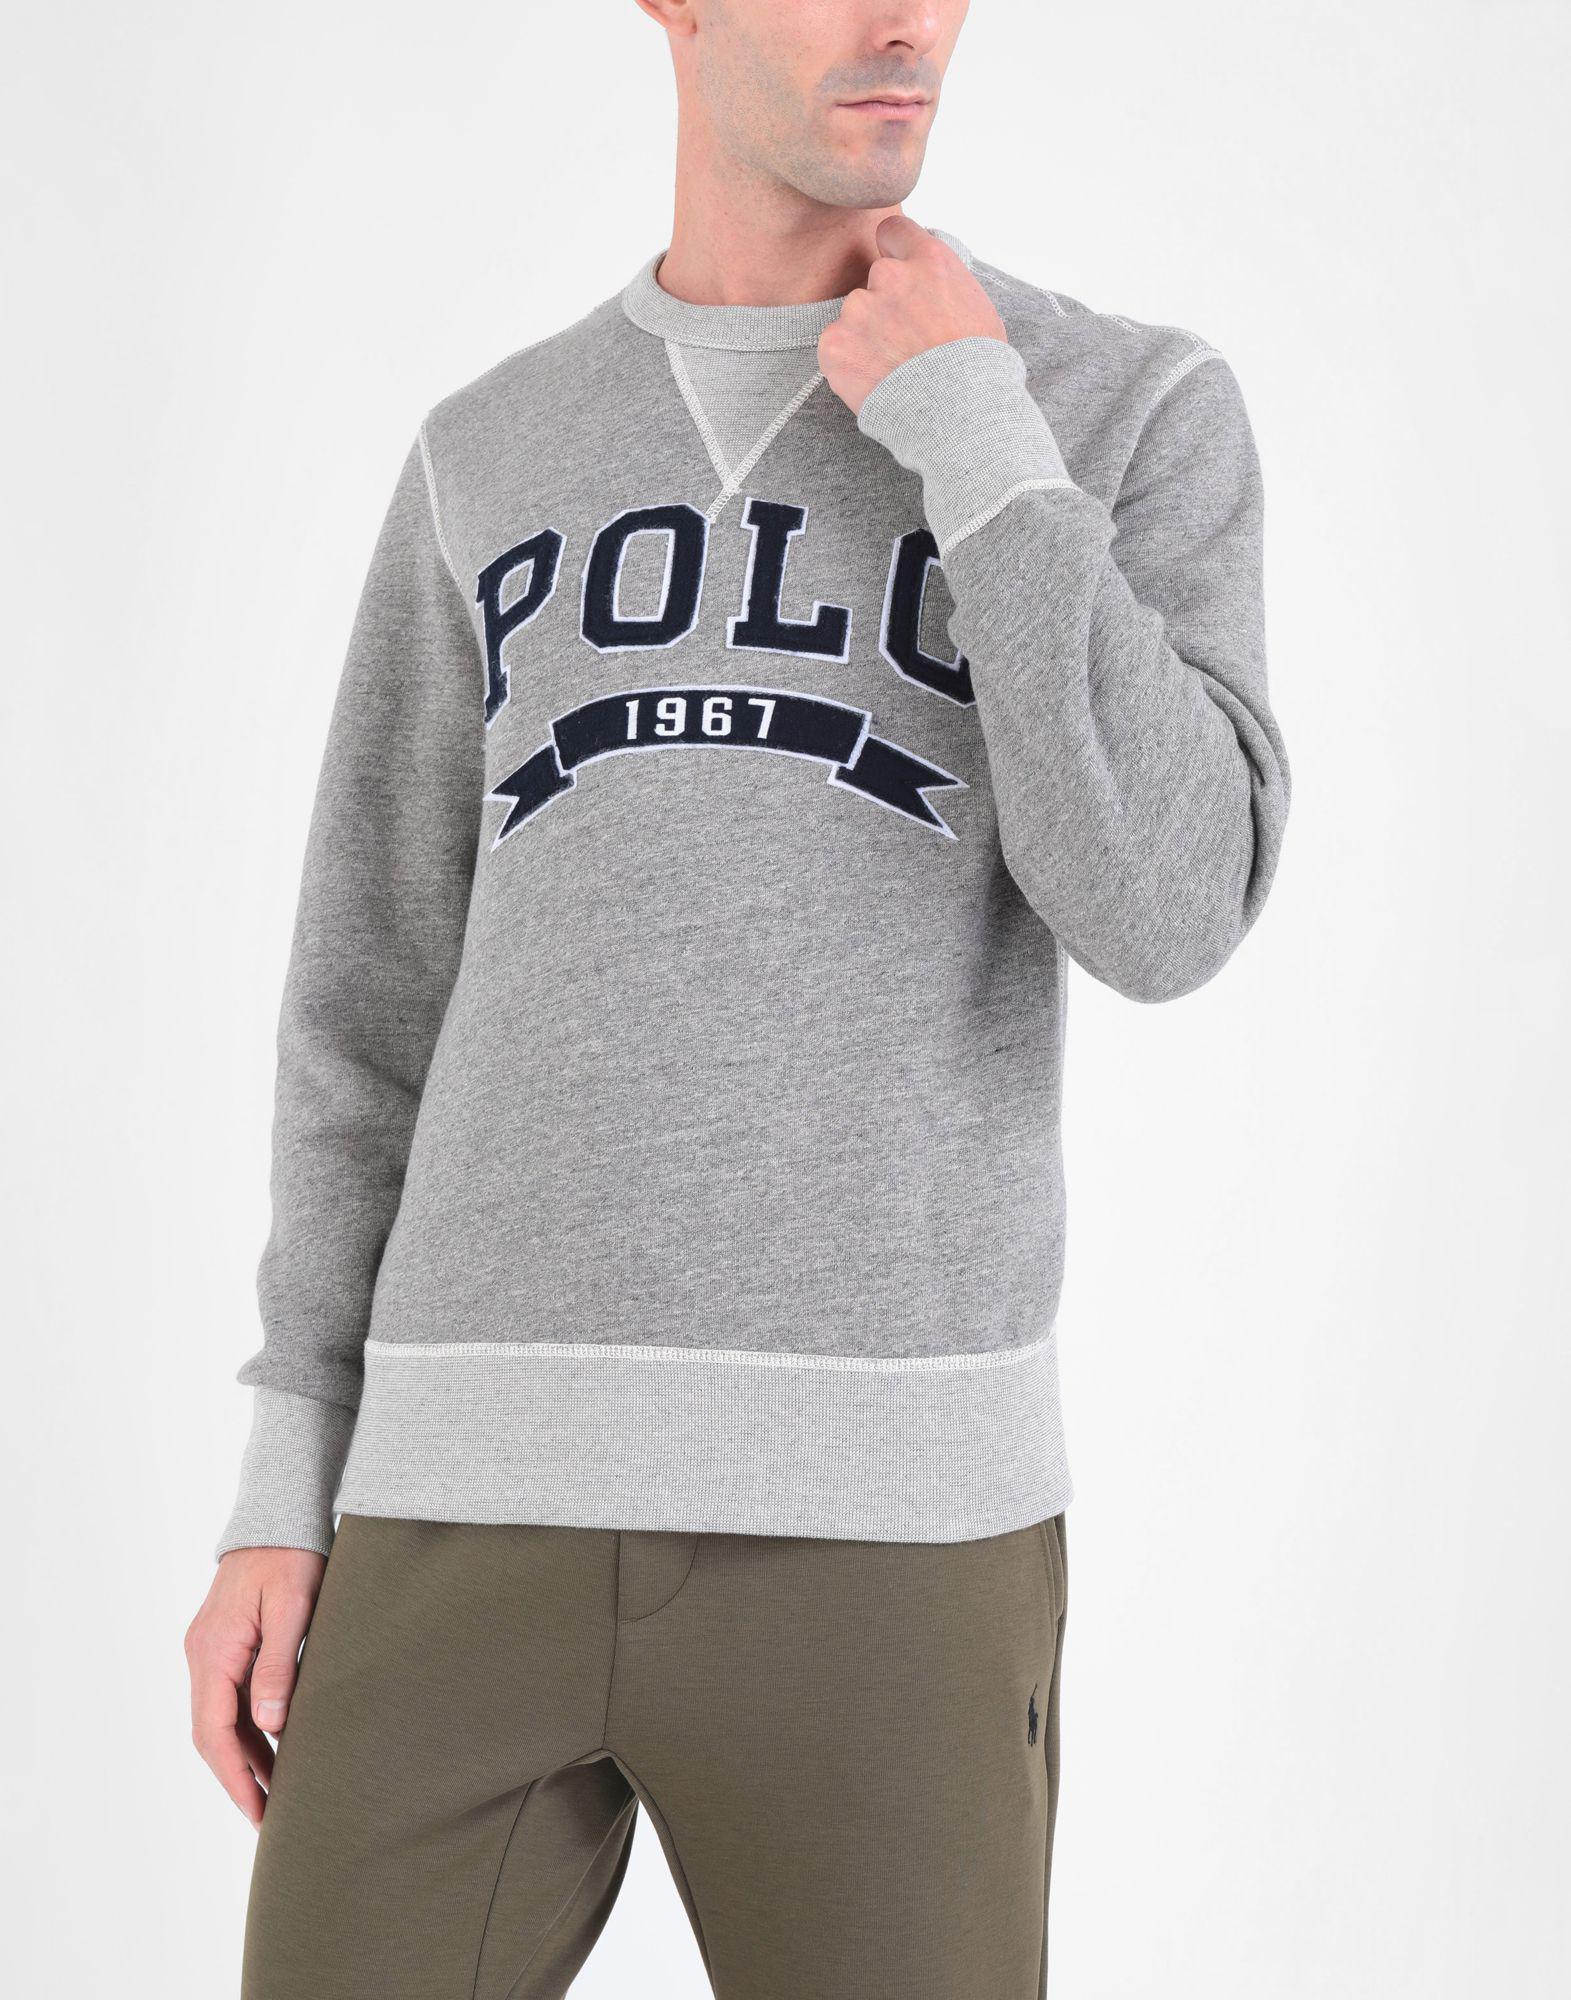 ad8b2d412190 Polo Ralph Lauren Cotton-blend-fleece Sweatshirt in Gray for Men - Save 70%  - Lyst